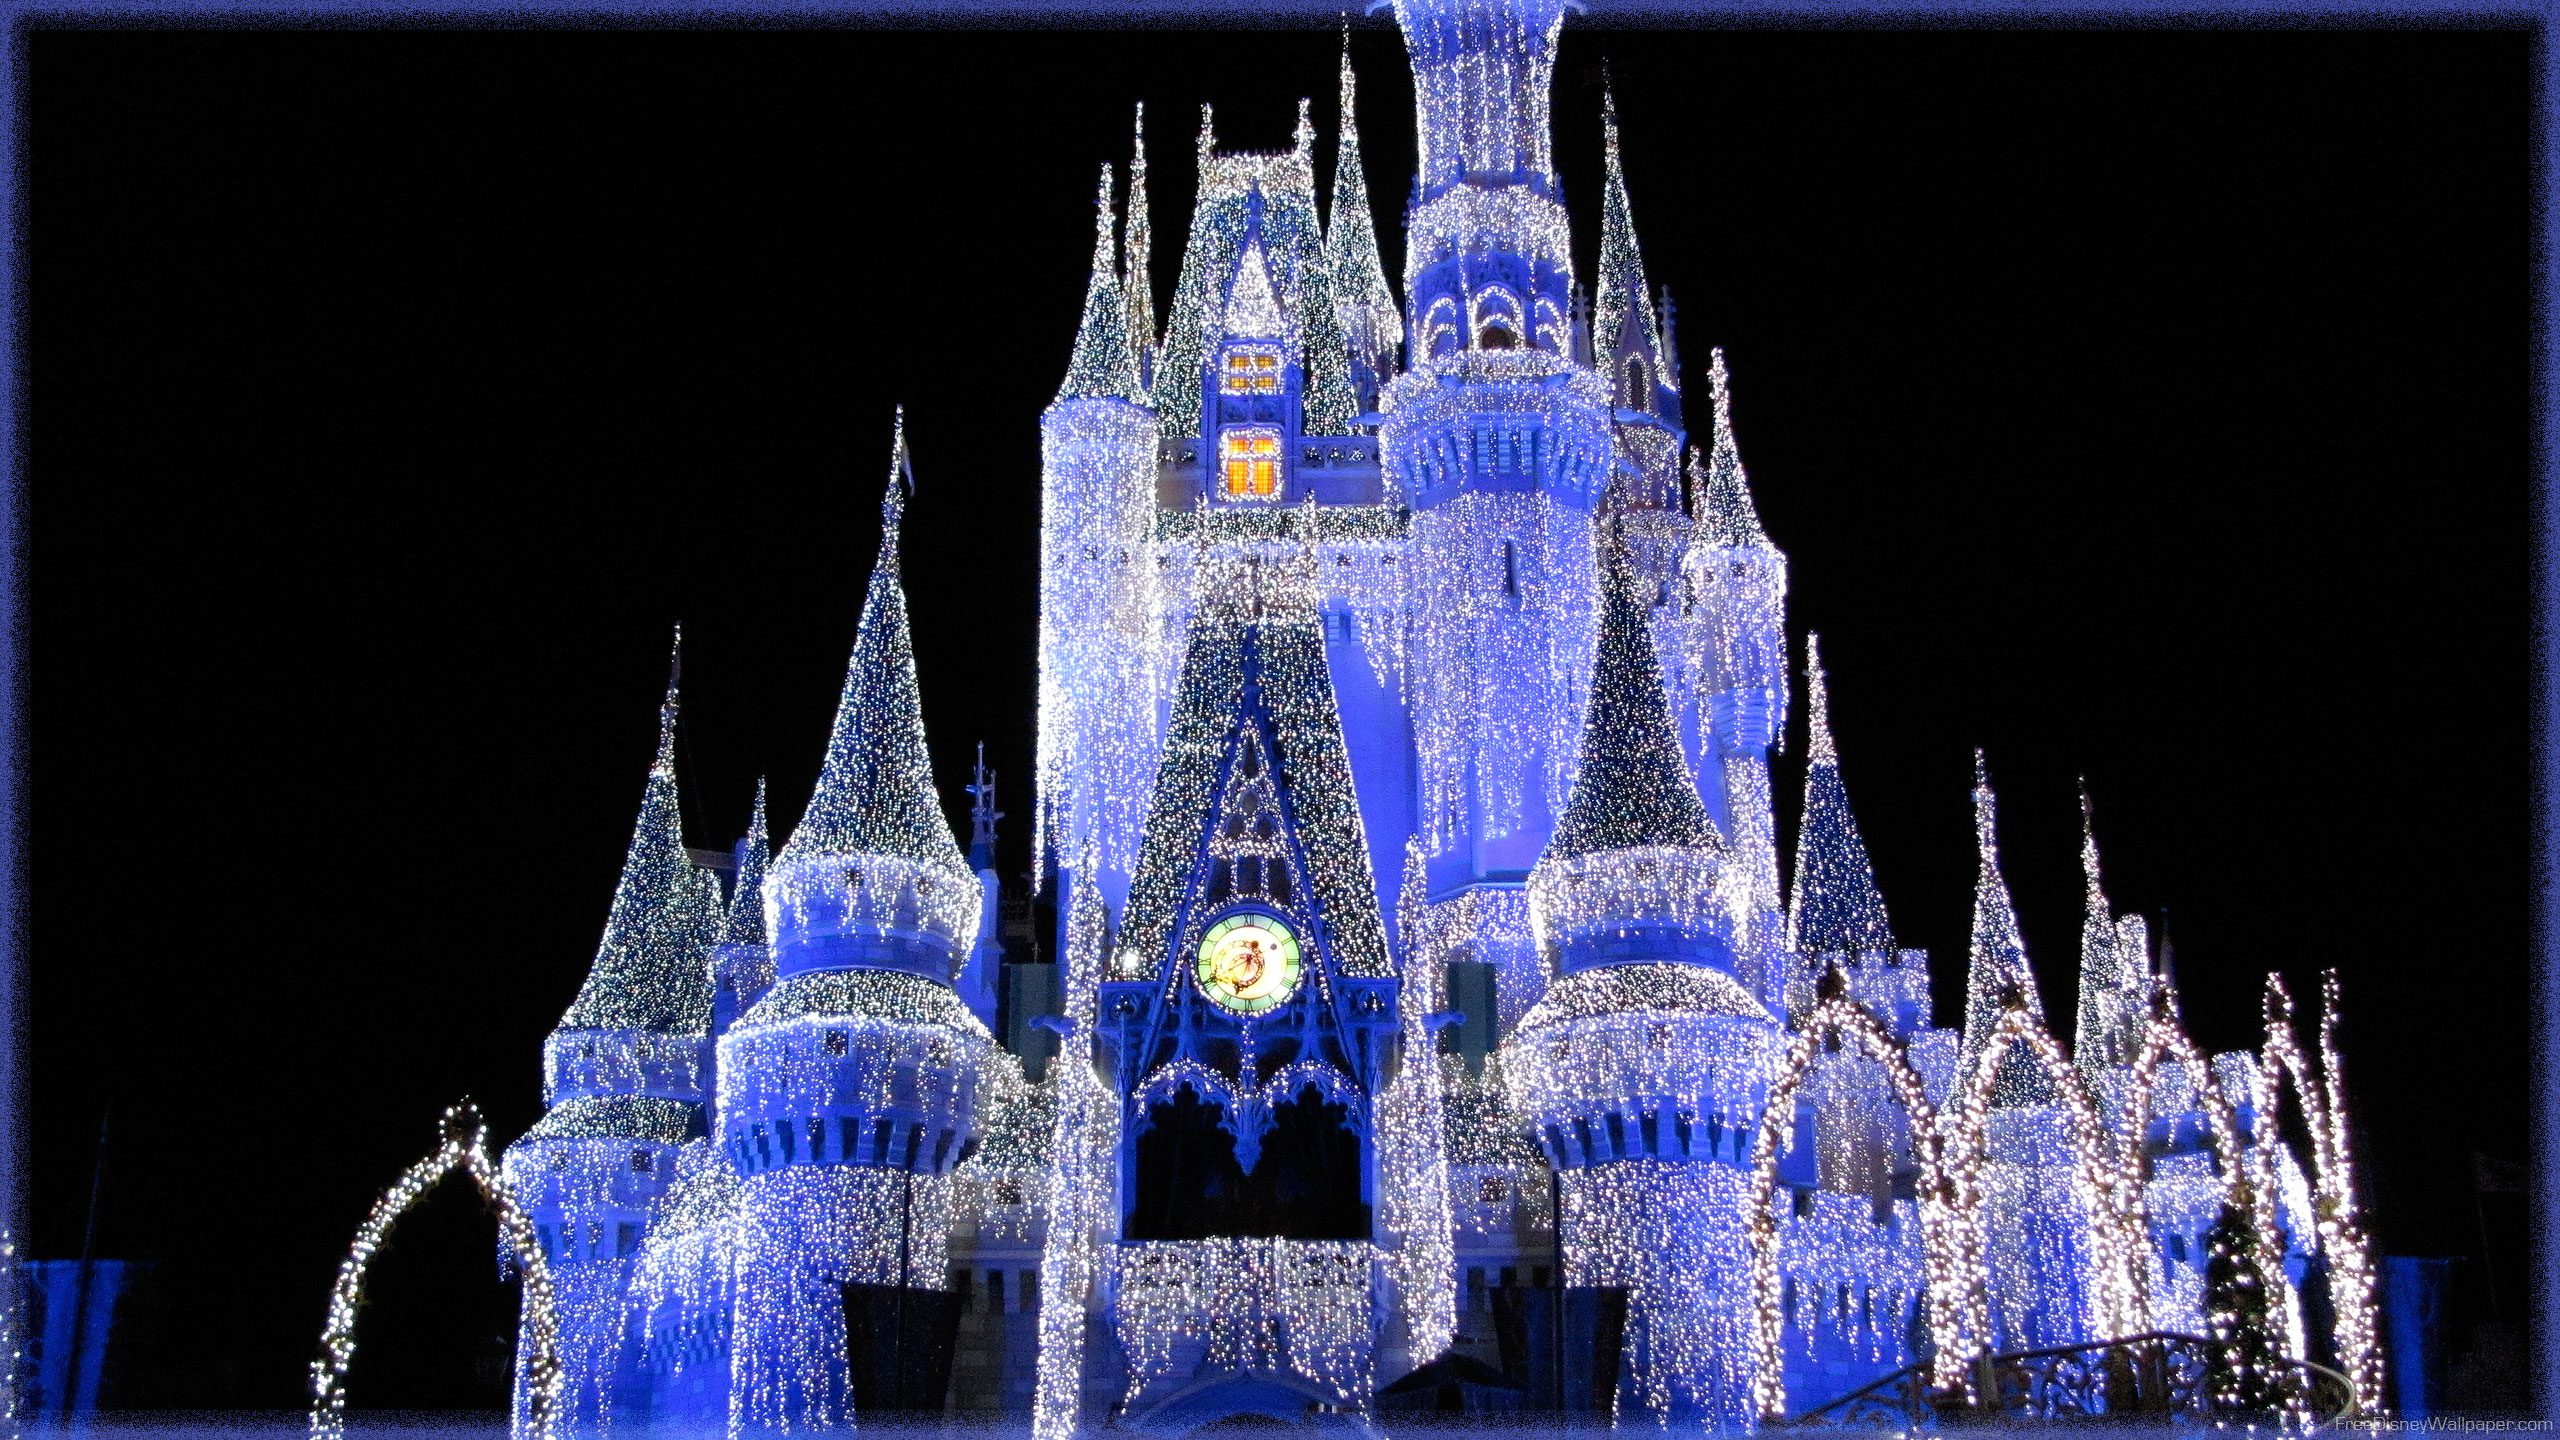 Free Download Disney World Christmas Castle Wallpaper Memestrendingspace 2560x1440 For Your Desktop Mobile Tablet Explore 50 Disney Castle Wallpaper Hd Disney Castle Christmas Wallpaper Disney Castle Wallpapers Free Disney